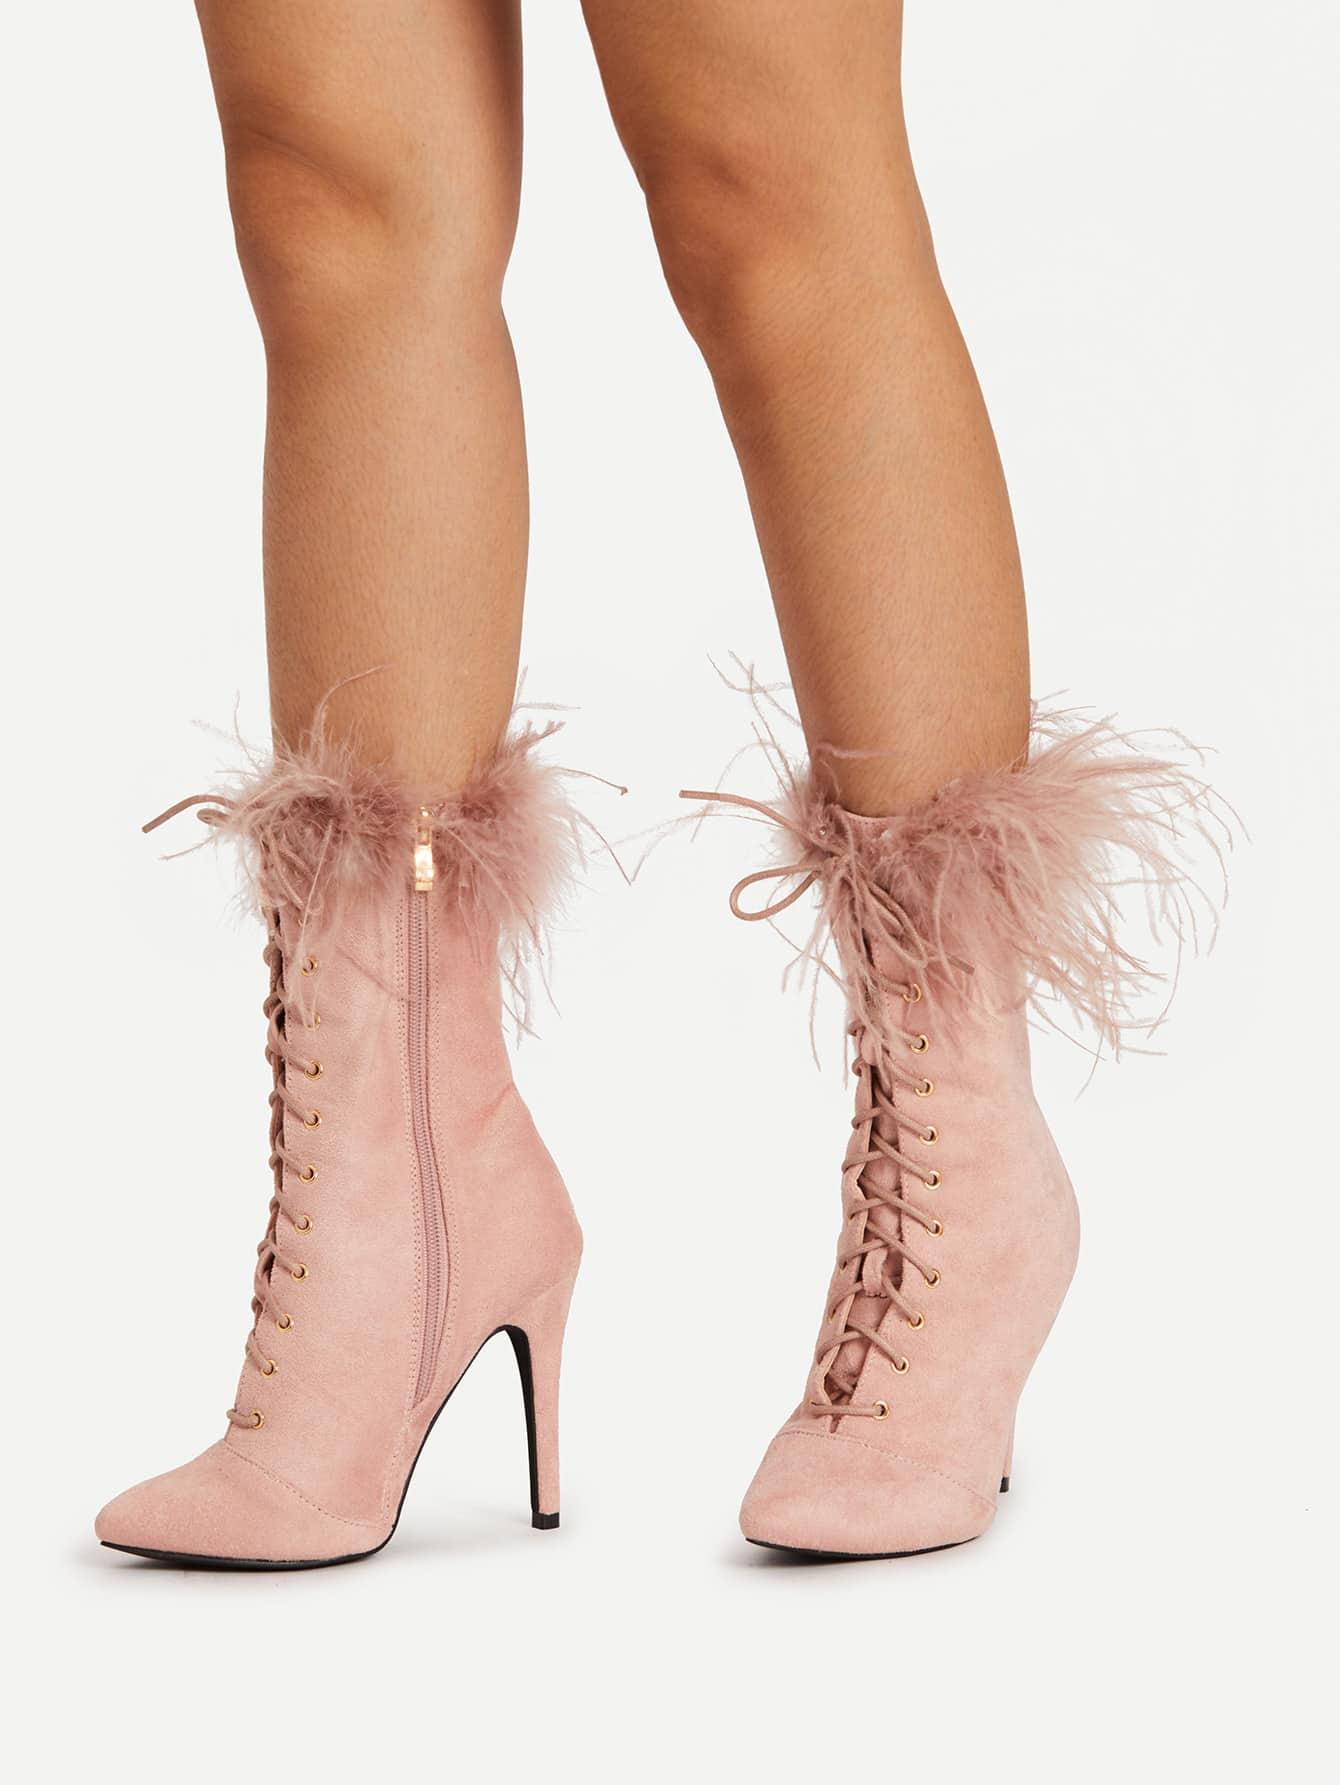 Faux Fur Point Toe Lace Up Ankle Boots shoes17091241